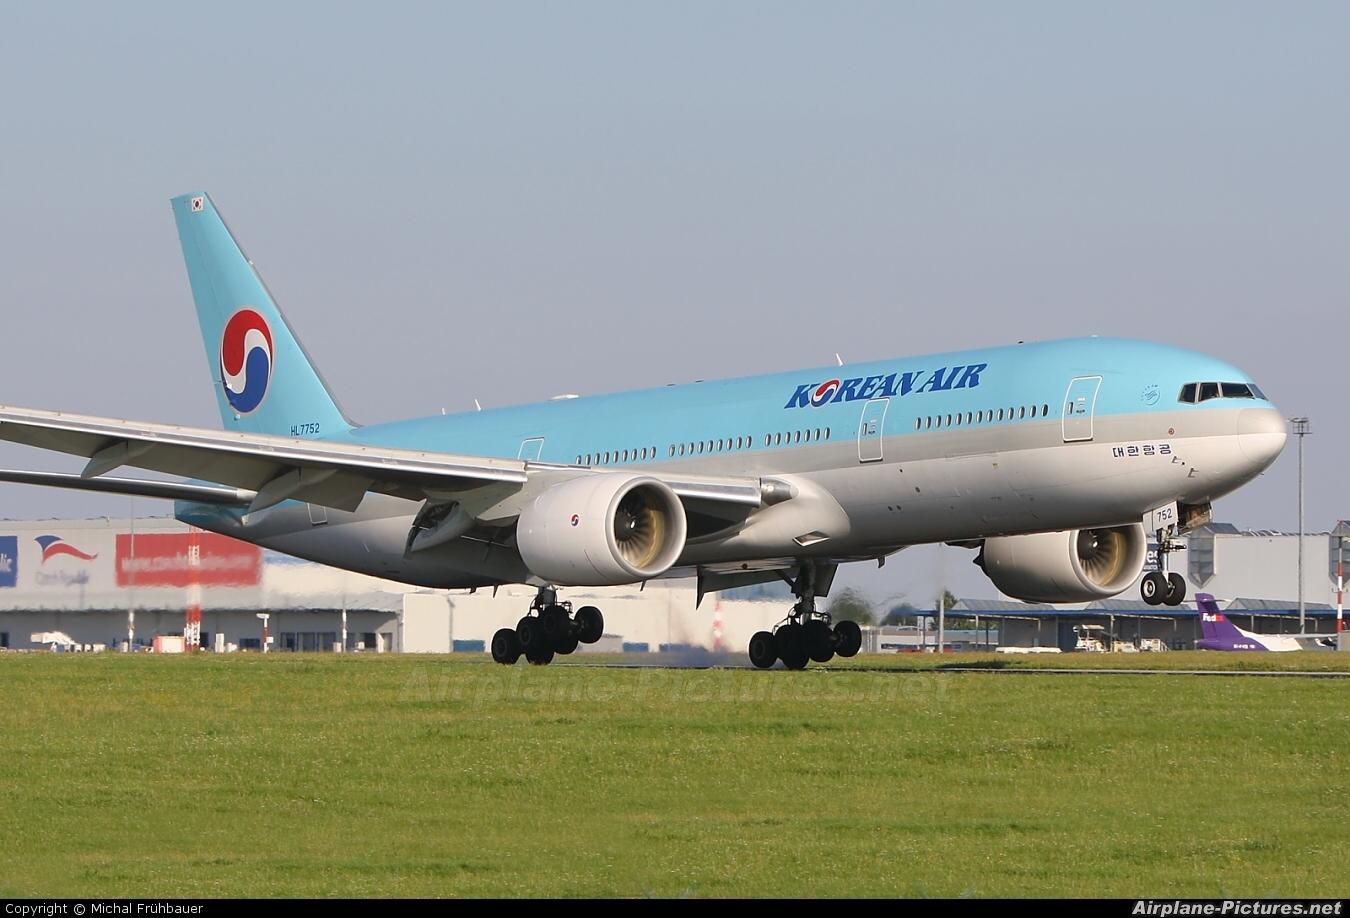 HL7752 - Korean Air Boeing 777-200ER at Prague